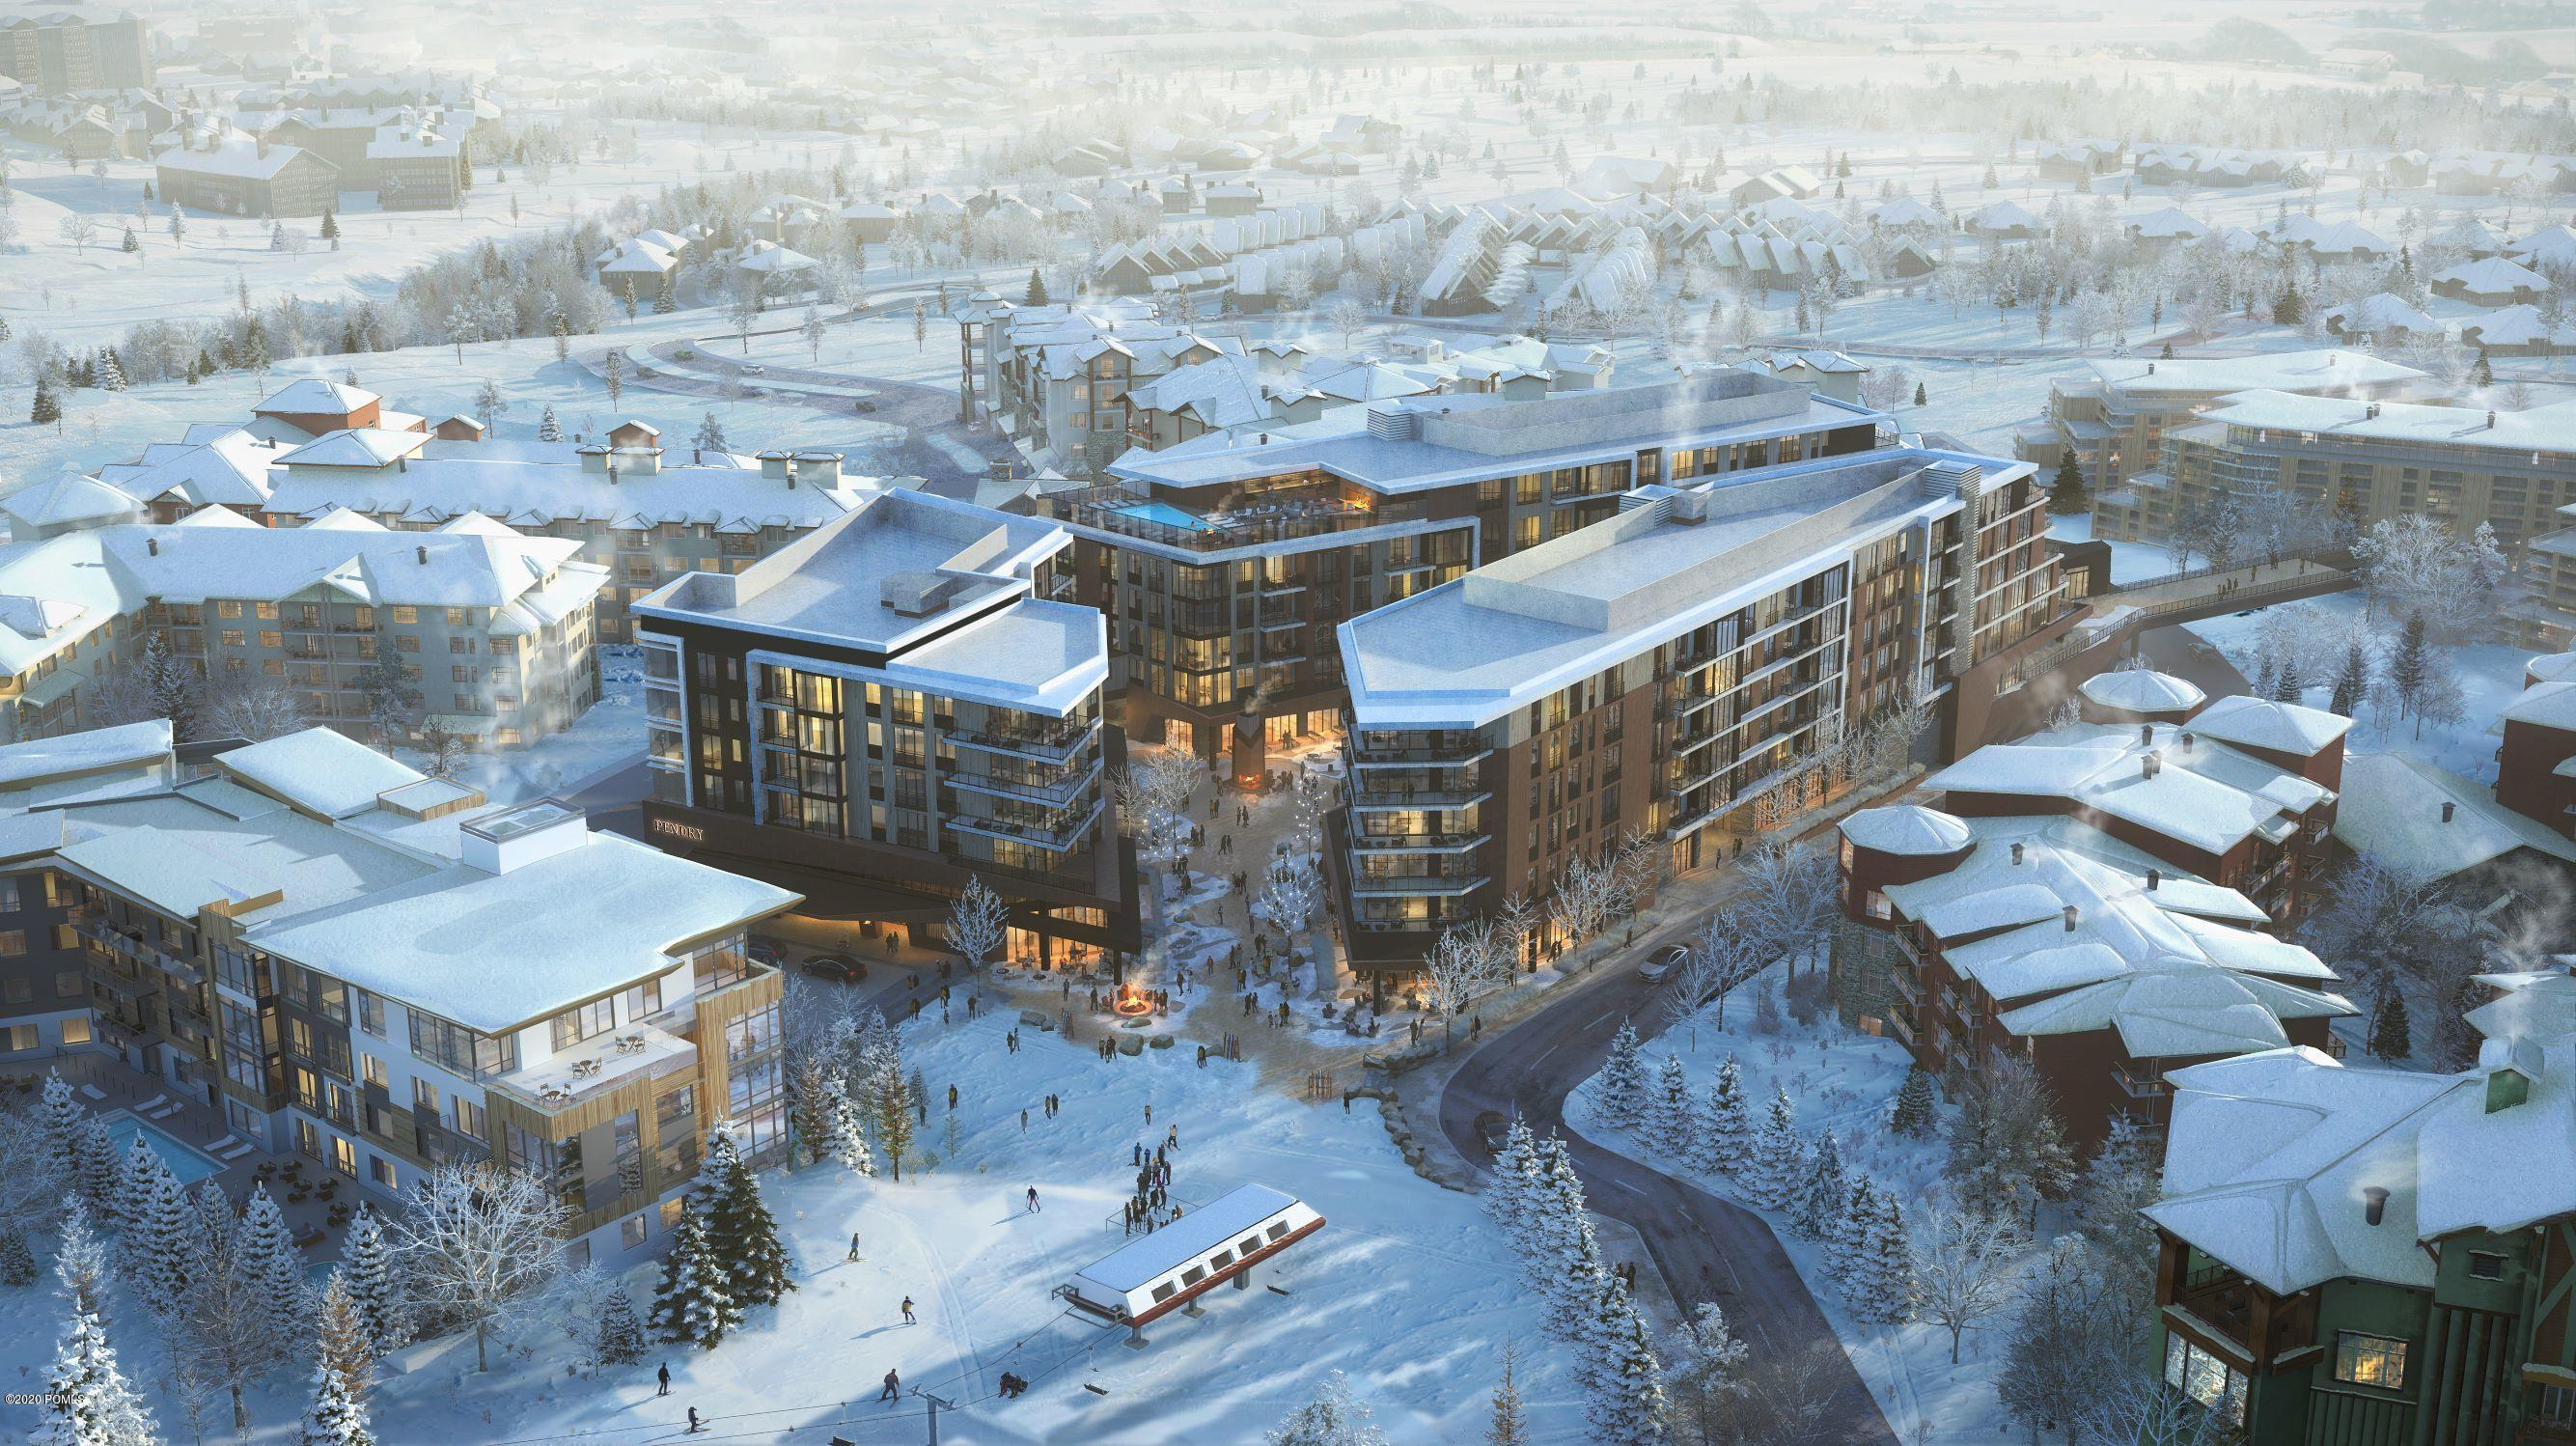 2417 High Mountain Road, Park City, Utah 84098, 2 Bedrooms Bedrooms, ,3 BathroomsBathrooms,Condominium,For Sale,High Mountain,12004359